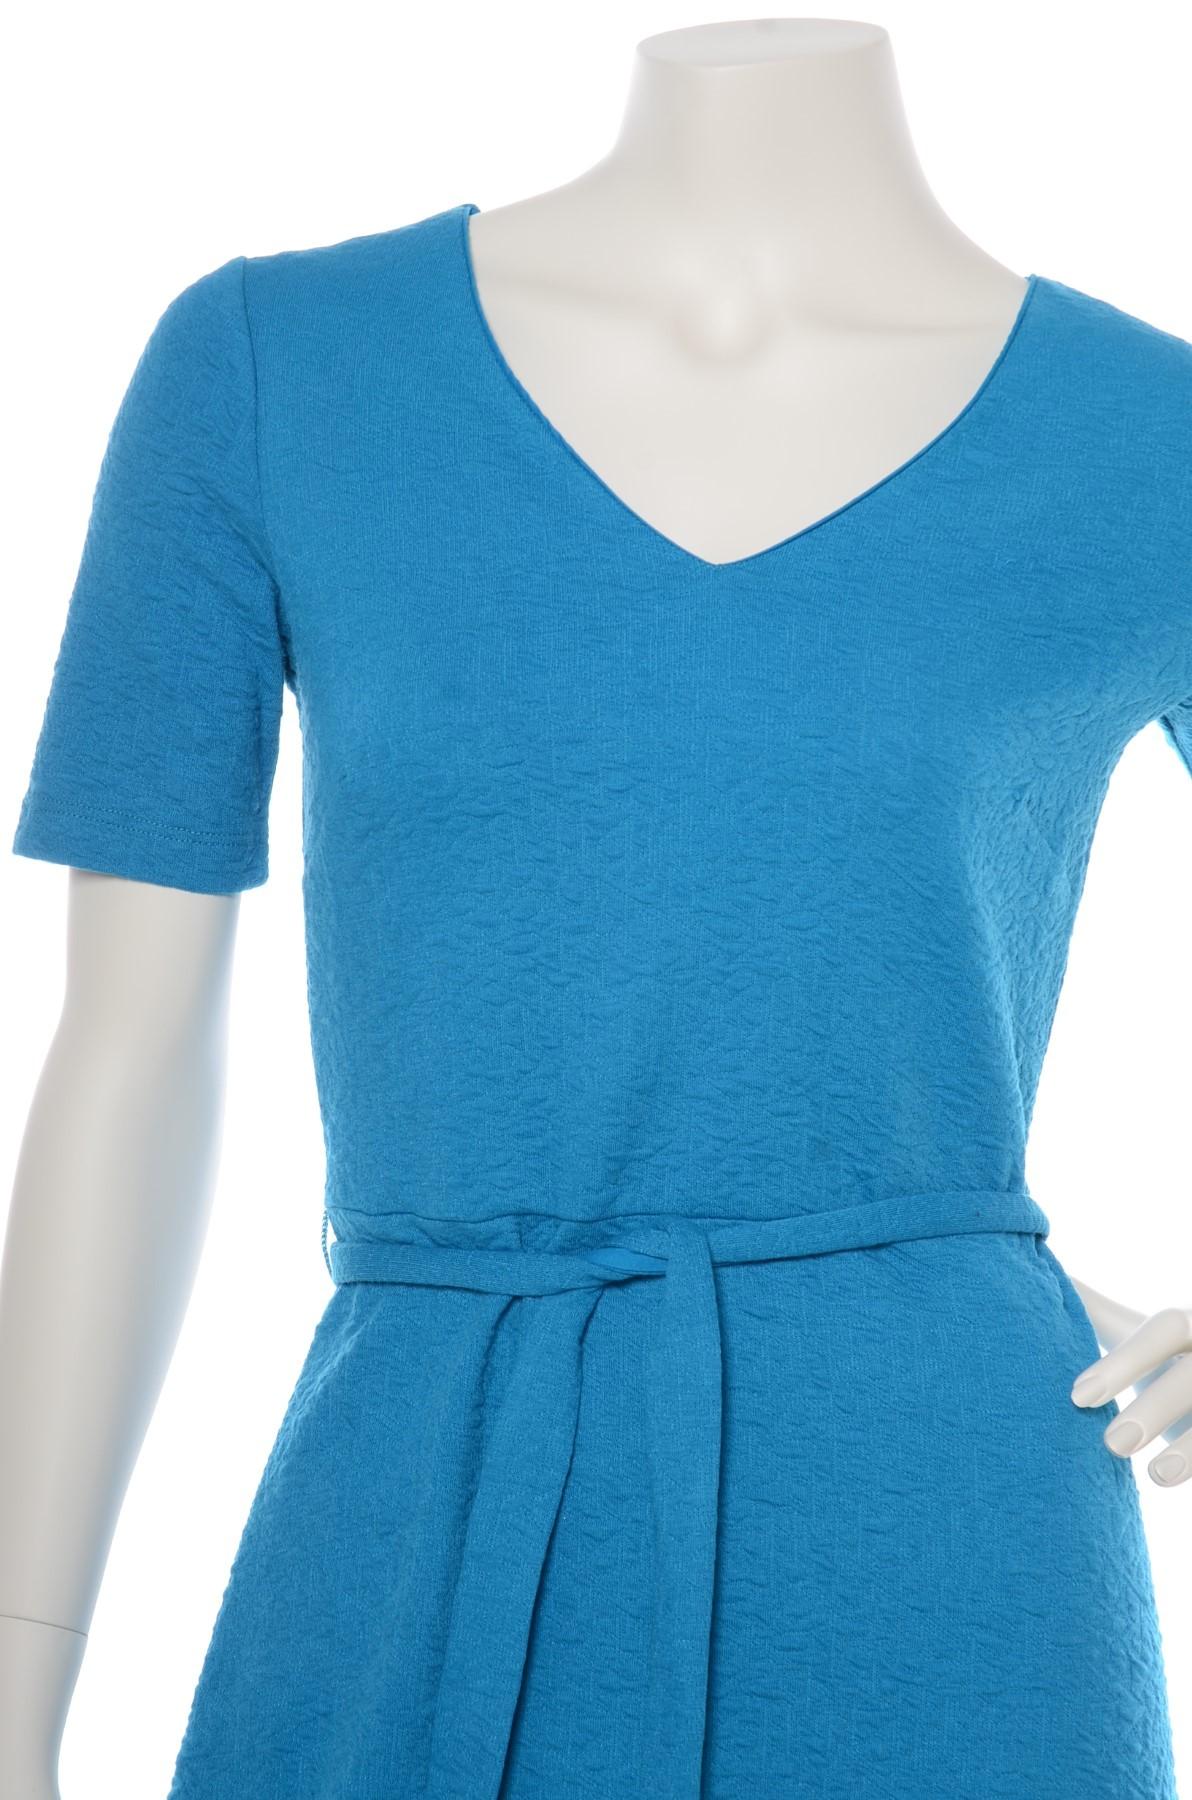 Genoeg Wow To Go jurk blauw dig » Casual TU72